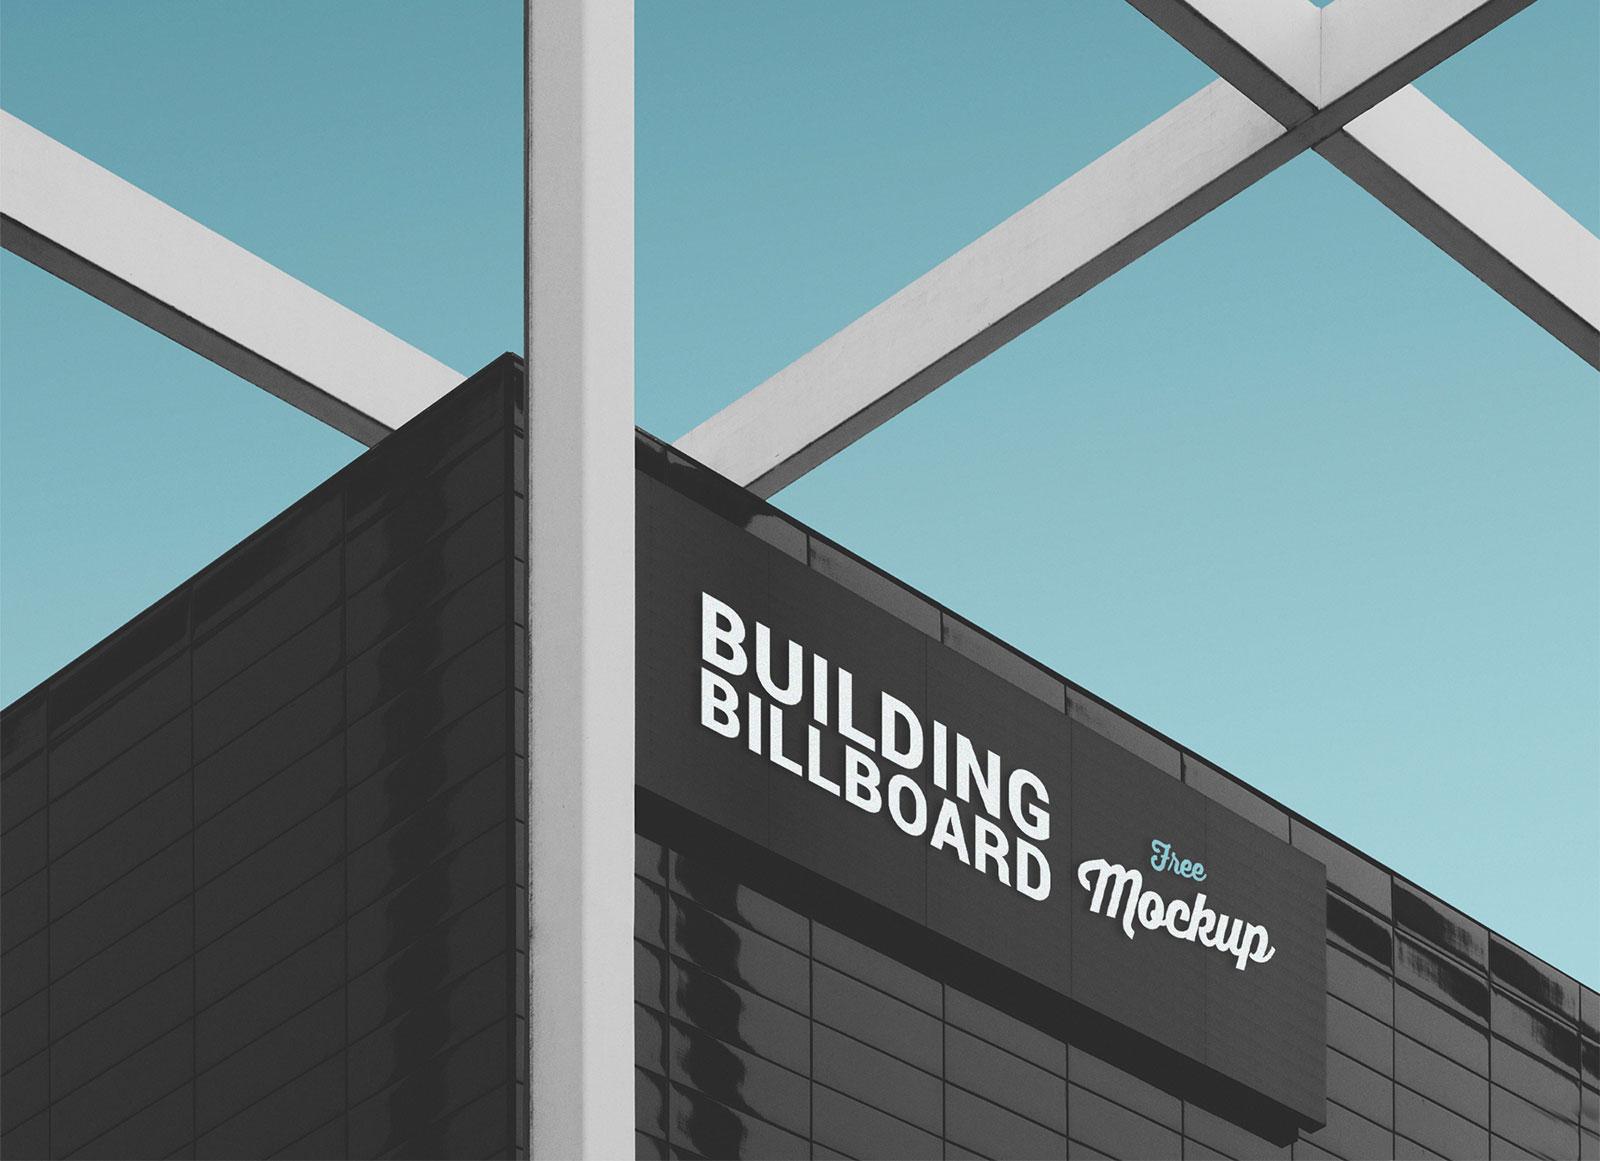 Free-Commercial-Office-Building-Billboard-Mockup-PSD